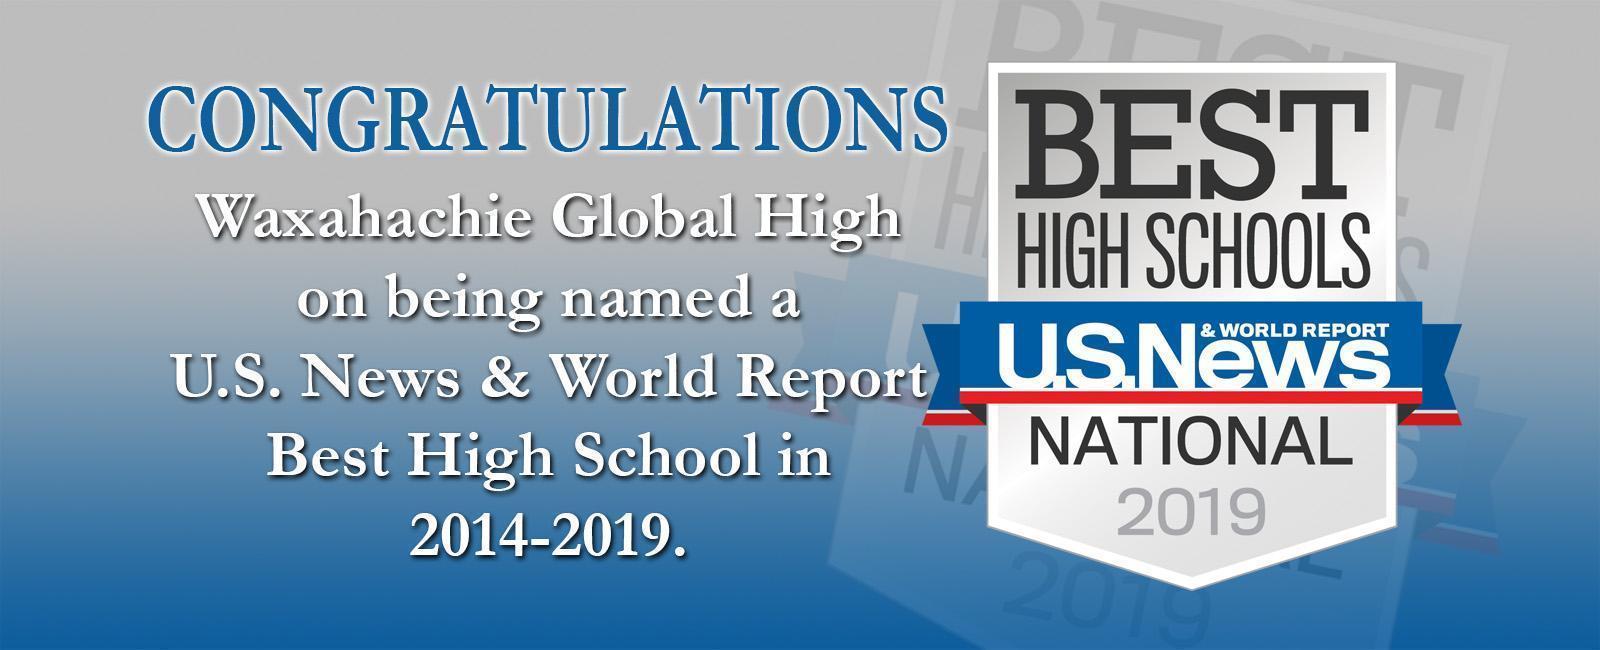 global high - best high school